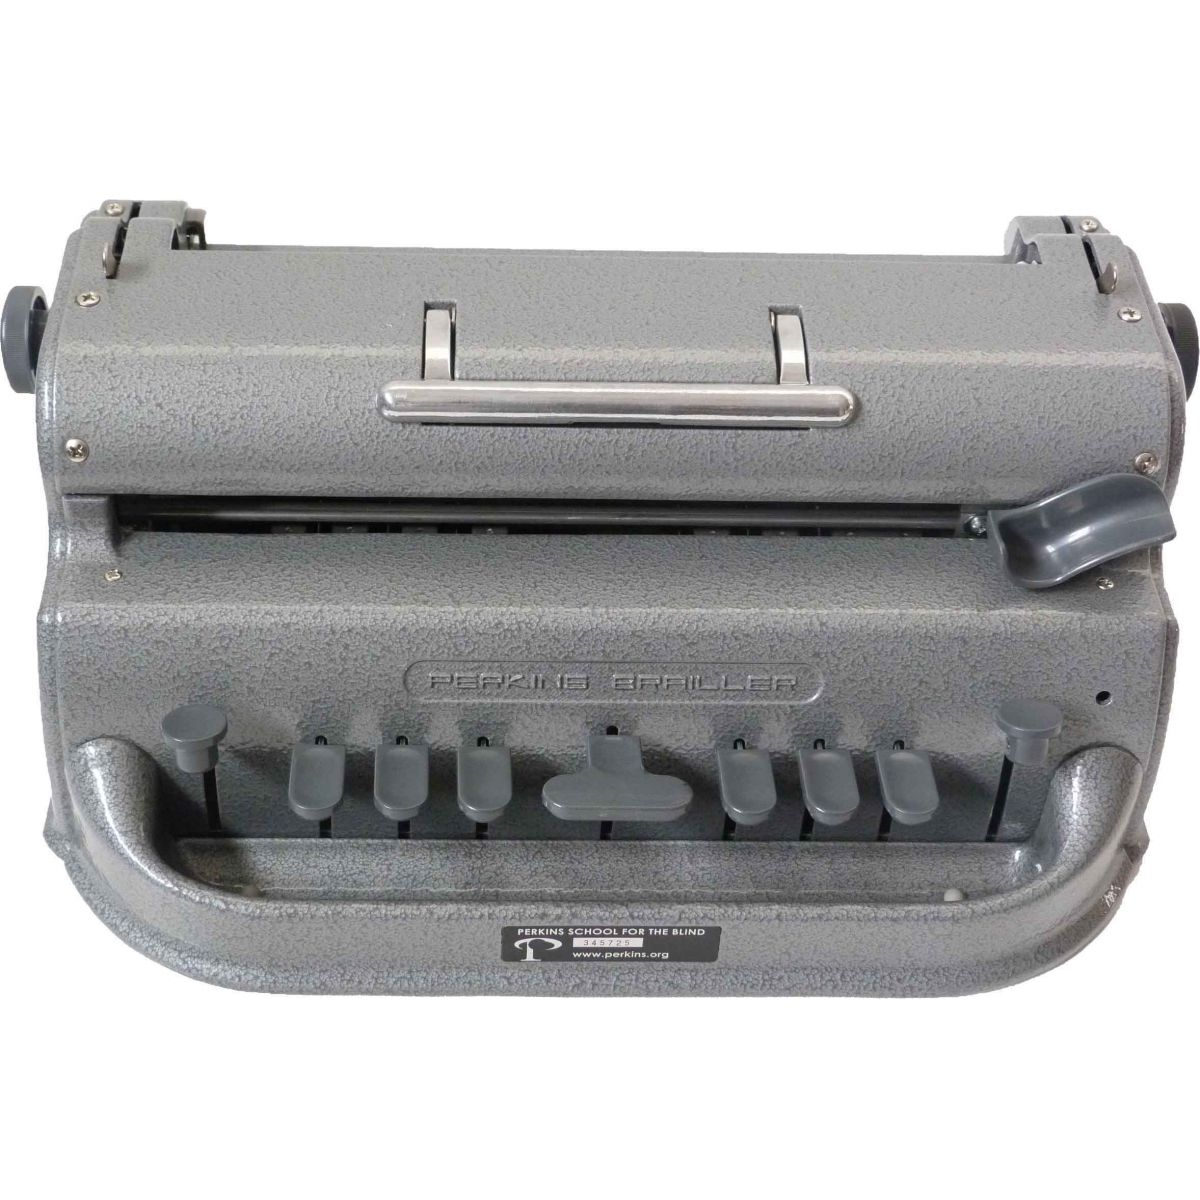 Máquina de Escrever Braille Perkins Brailler